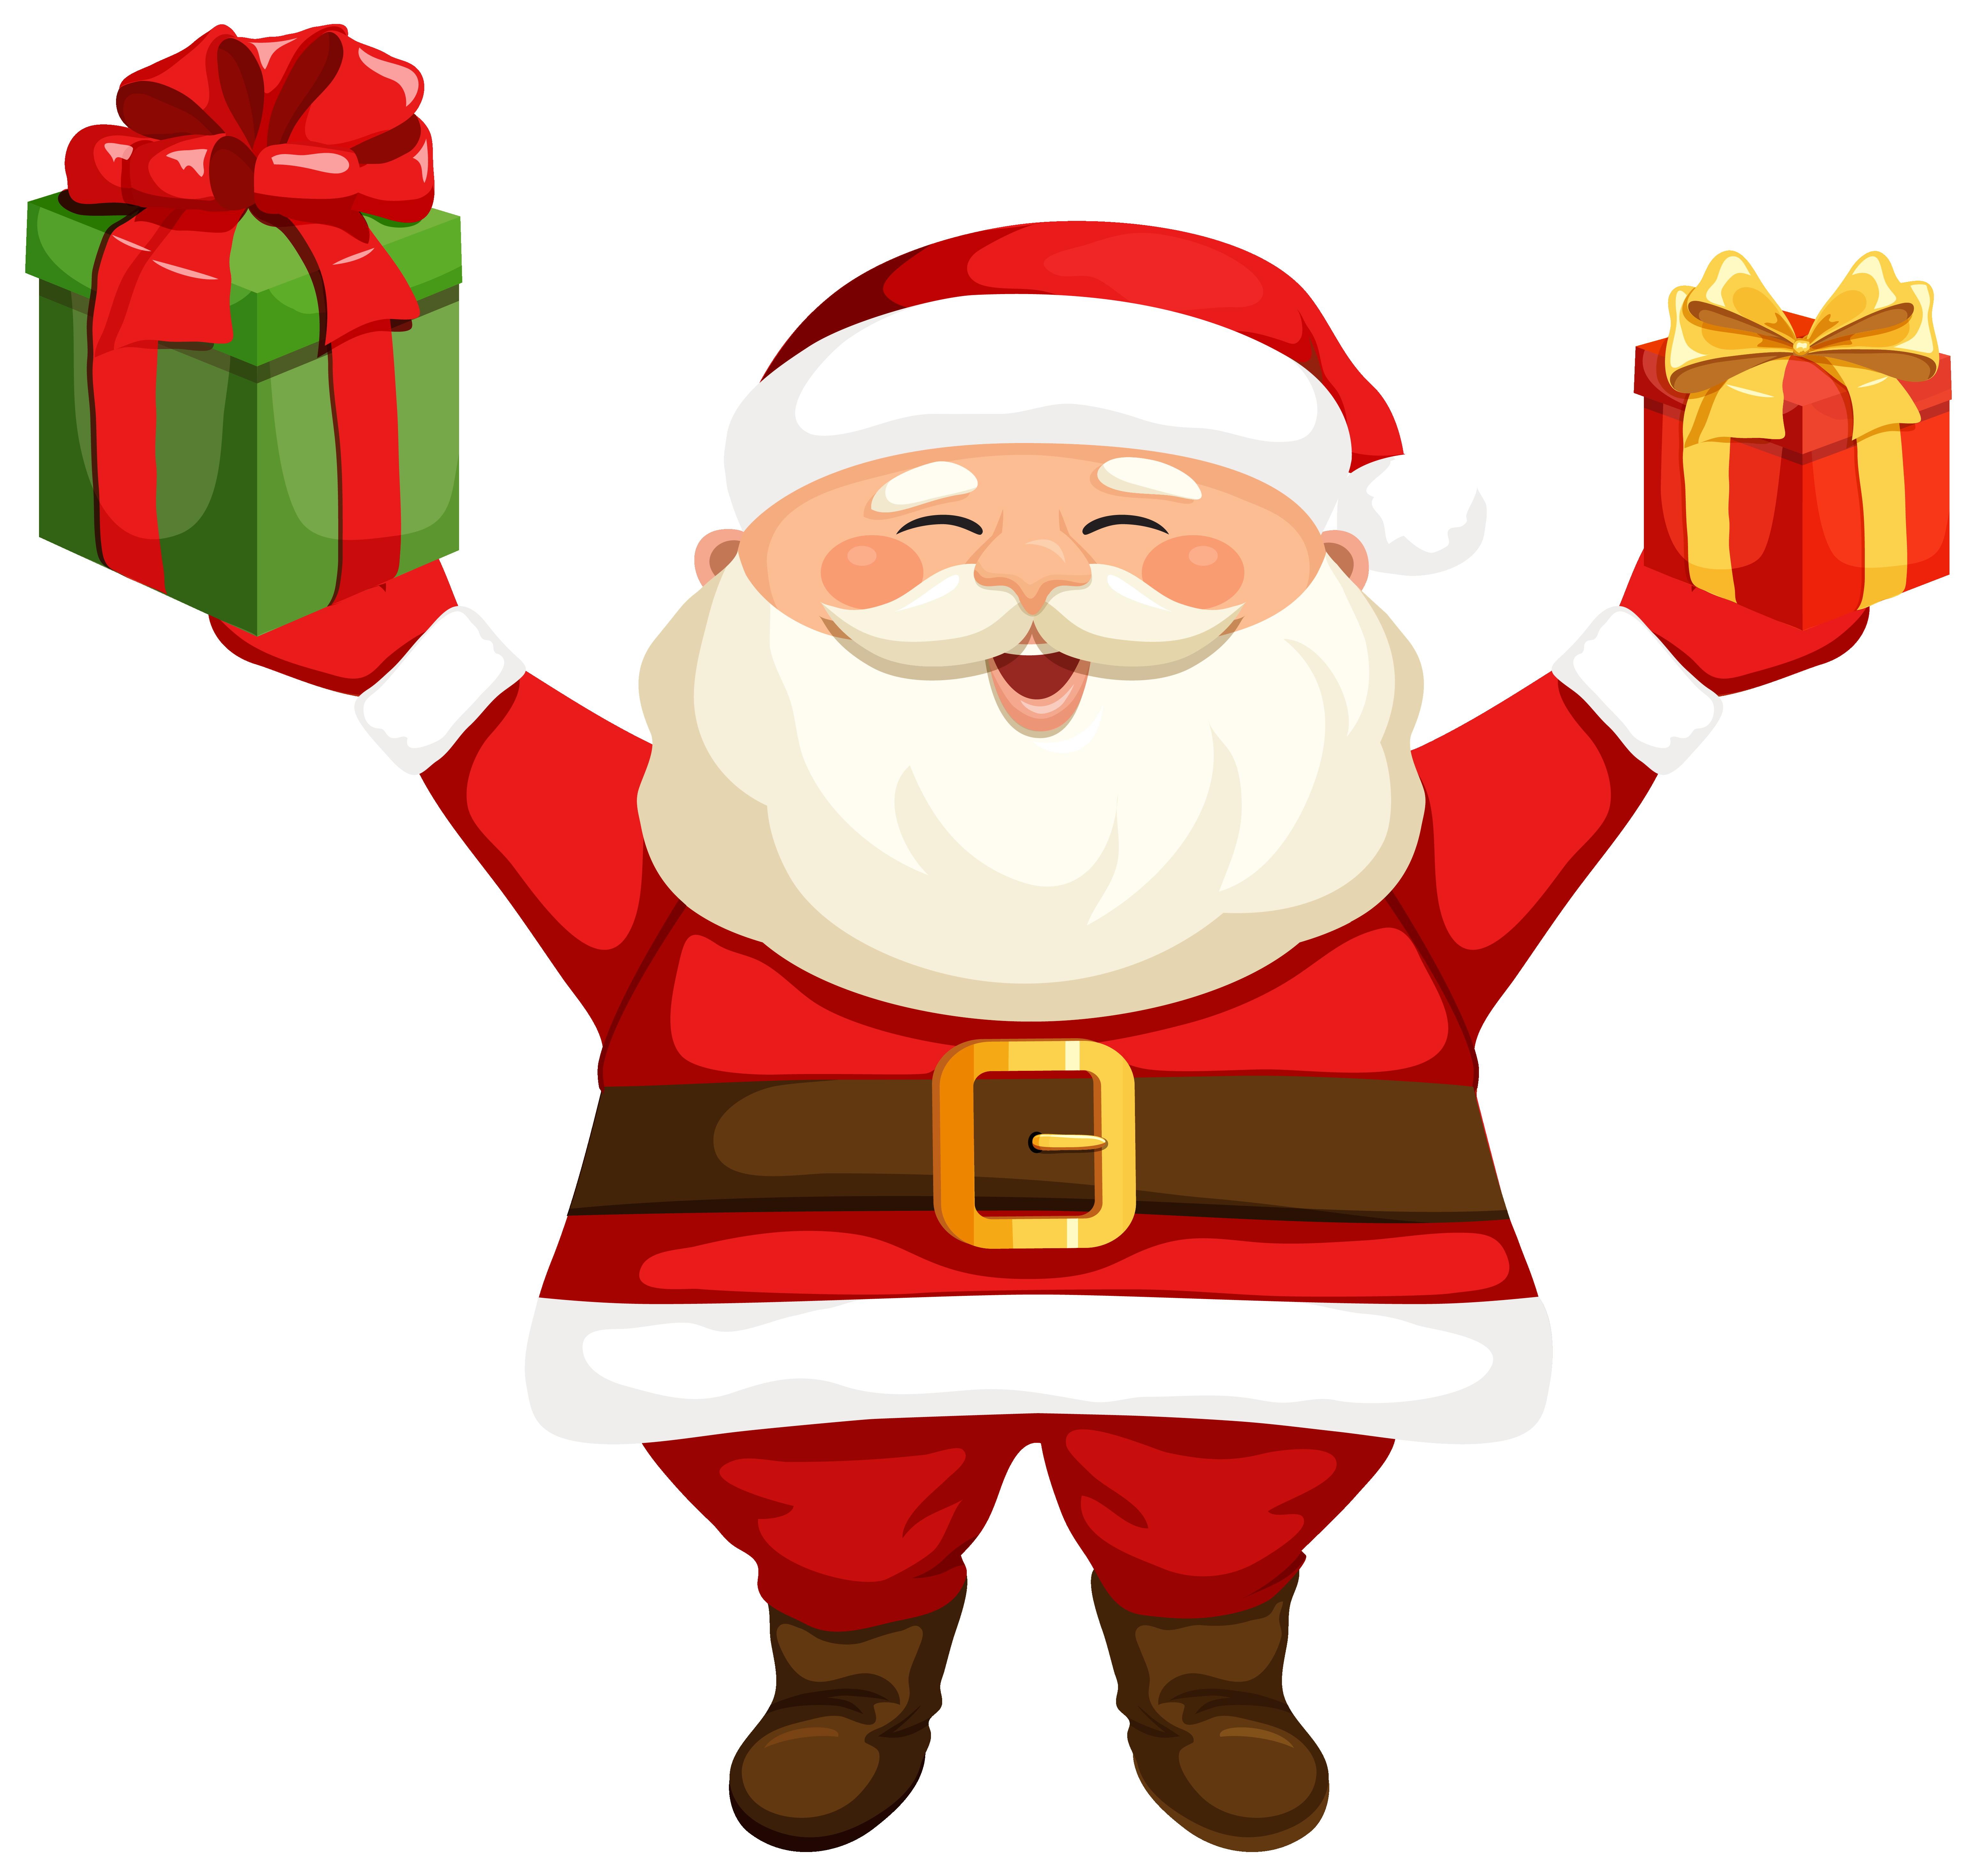 6184x5869 Santa Claus Clip Art Schliferaward